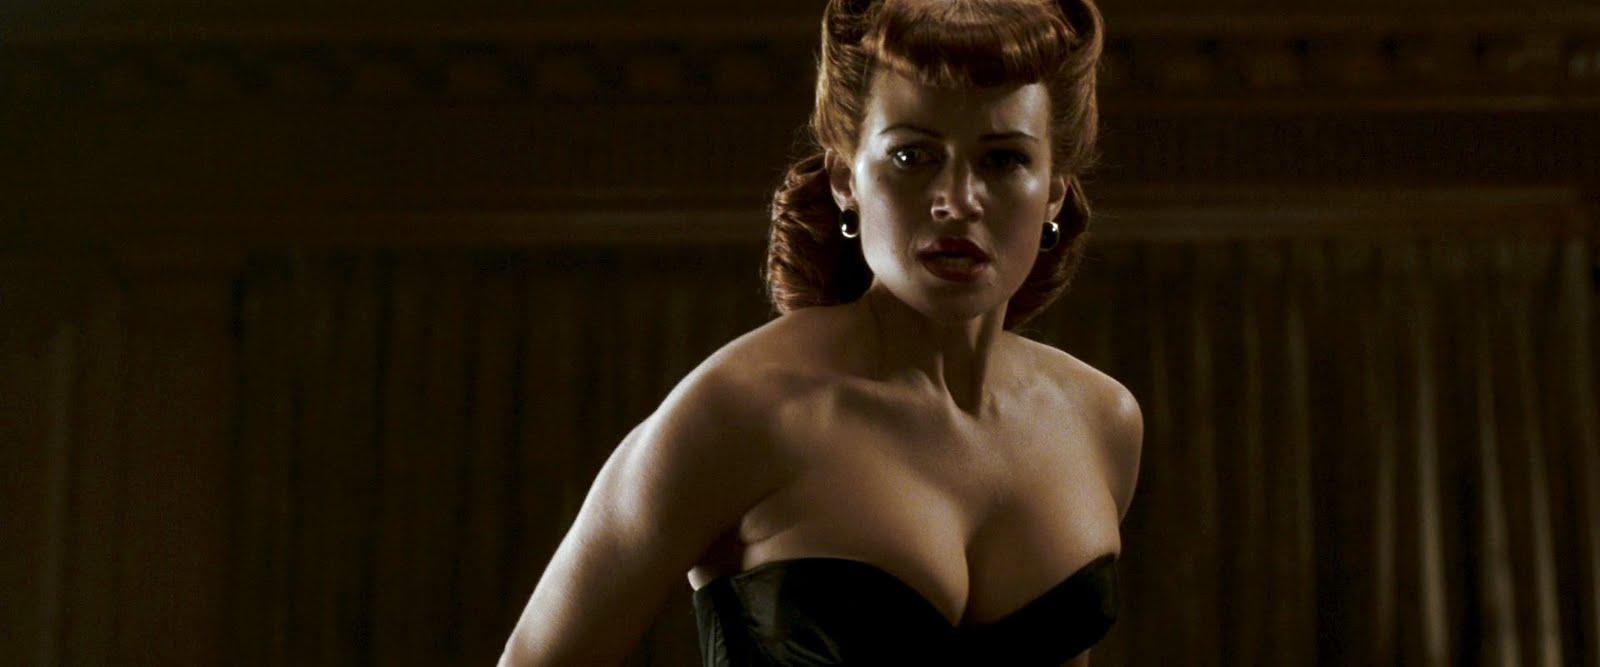 Watchmen movie sex scenes come forum